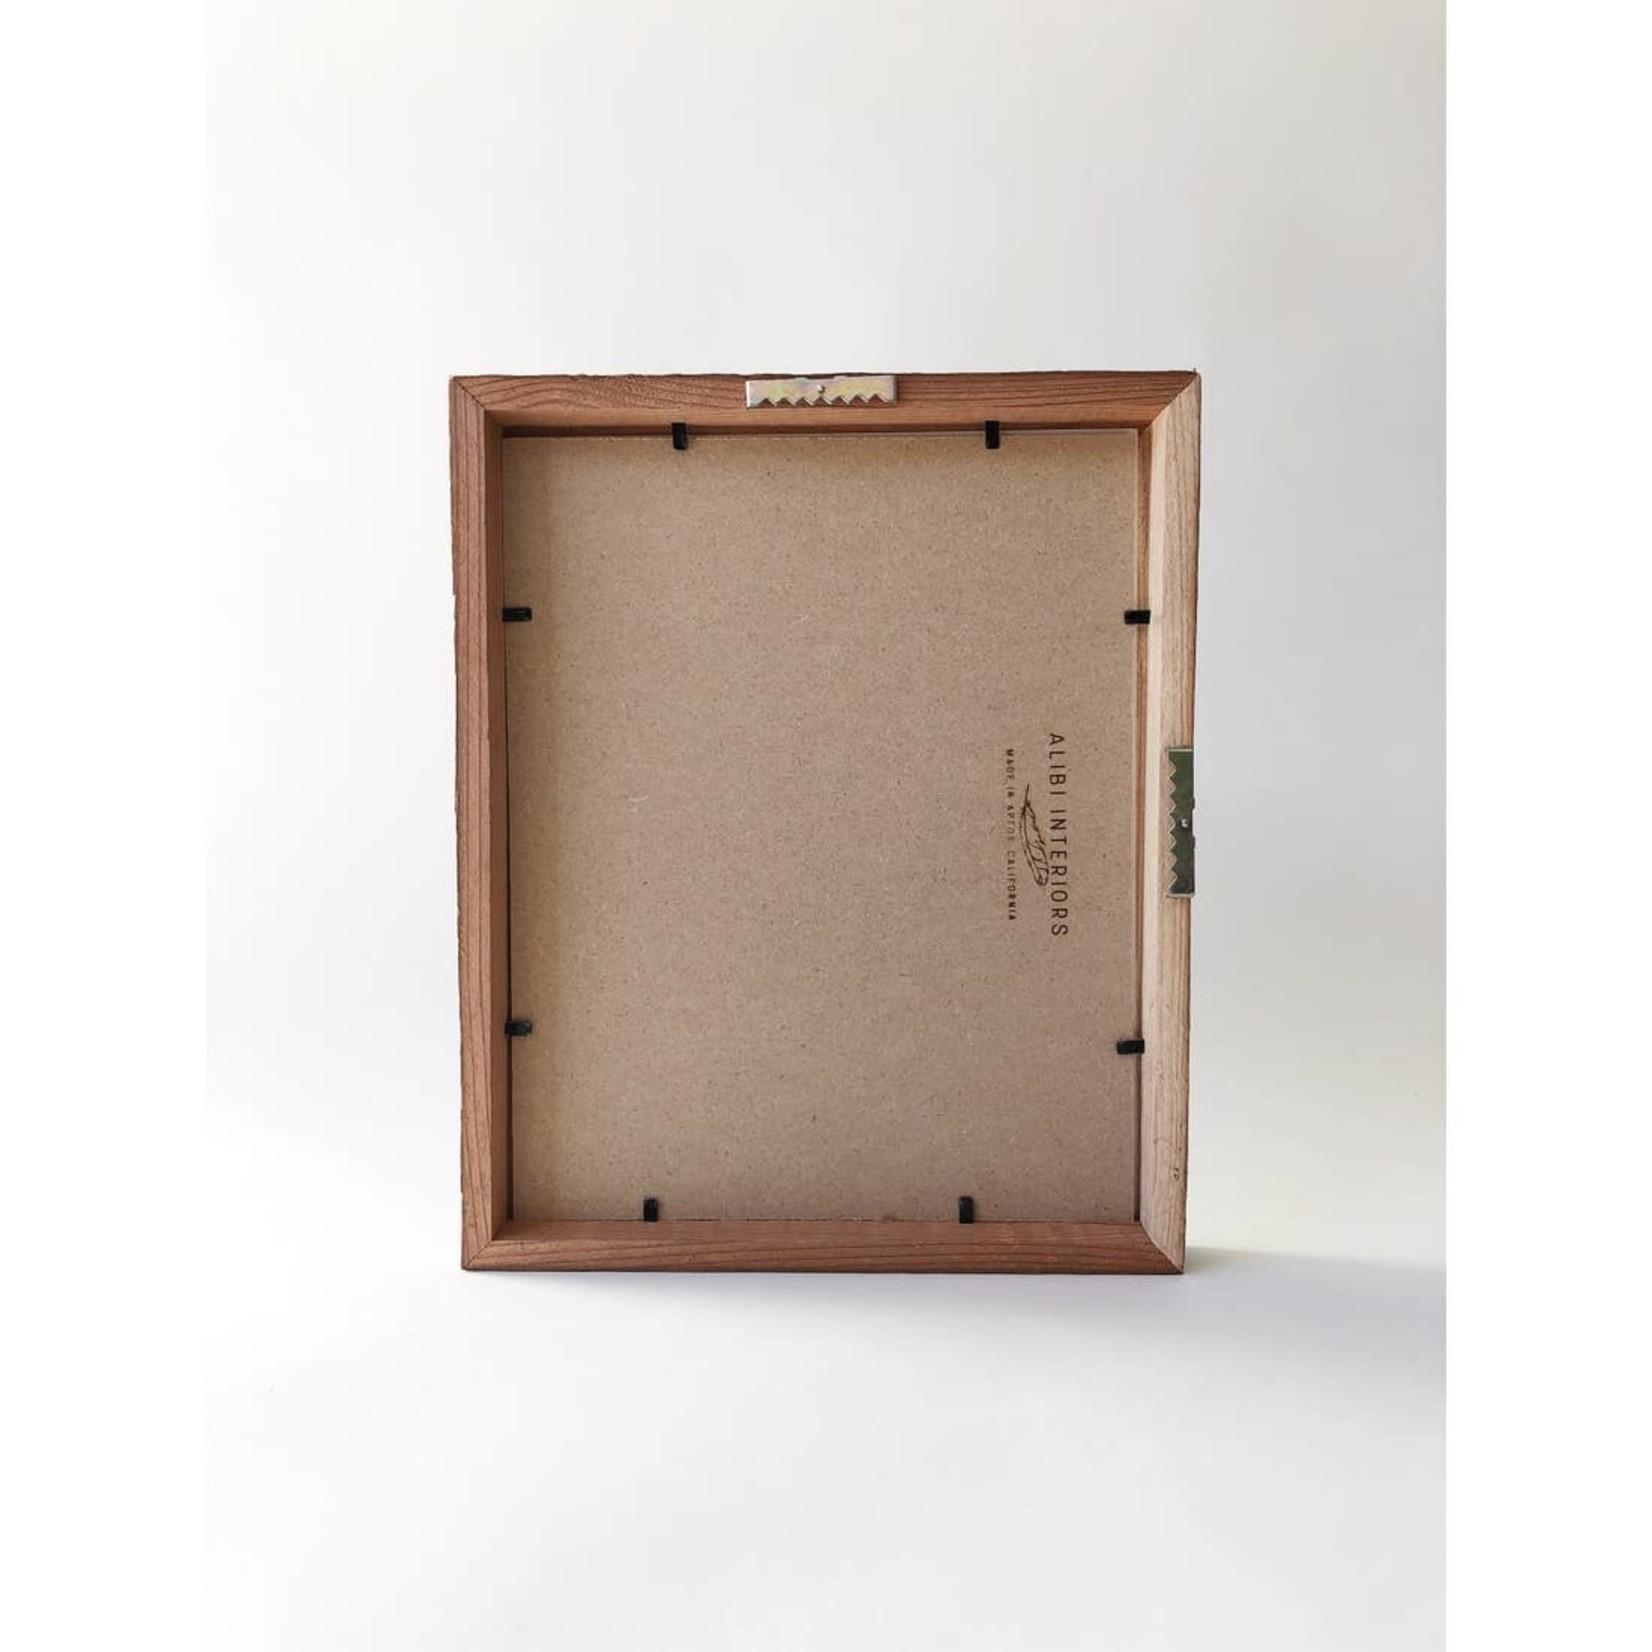 Alibi Interiors Alibi Reclaimed Wood Gallery Frame 8x10